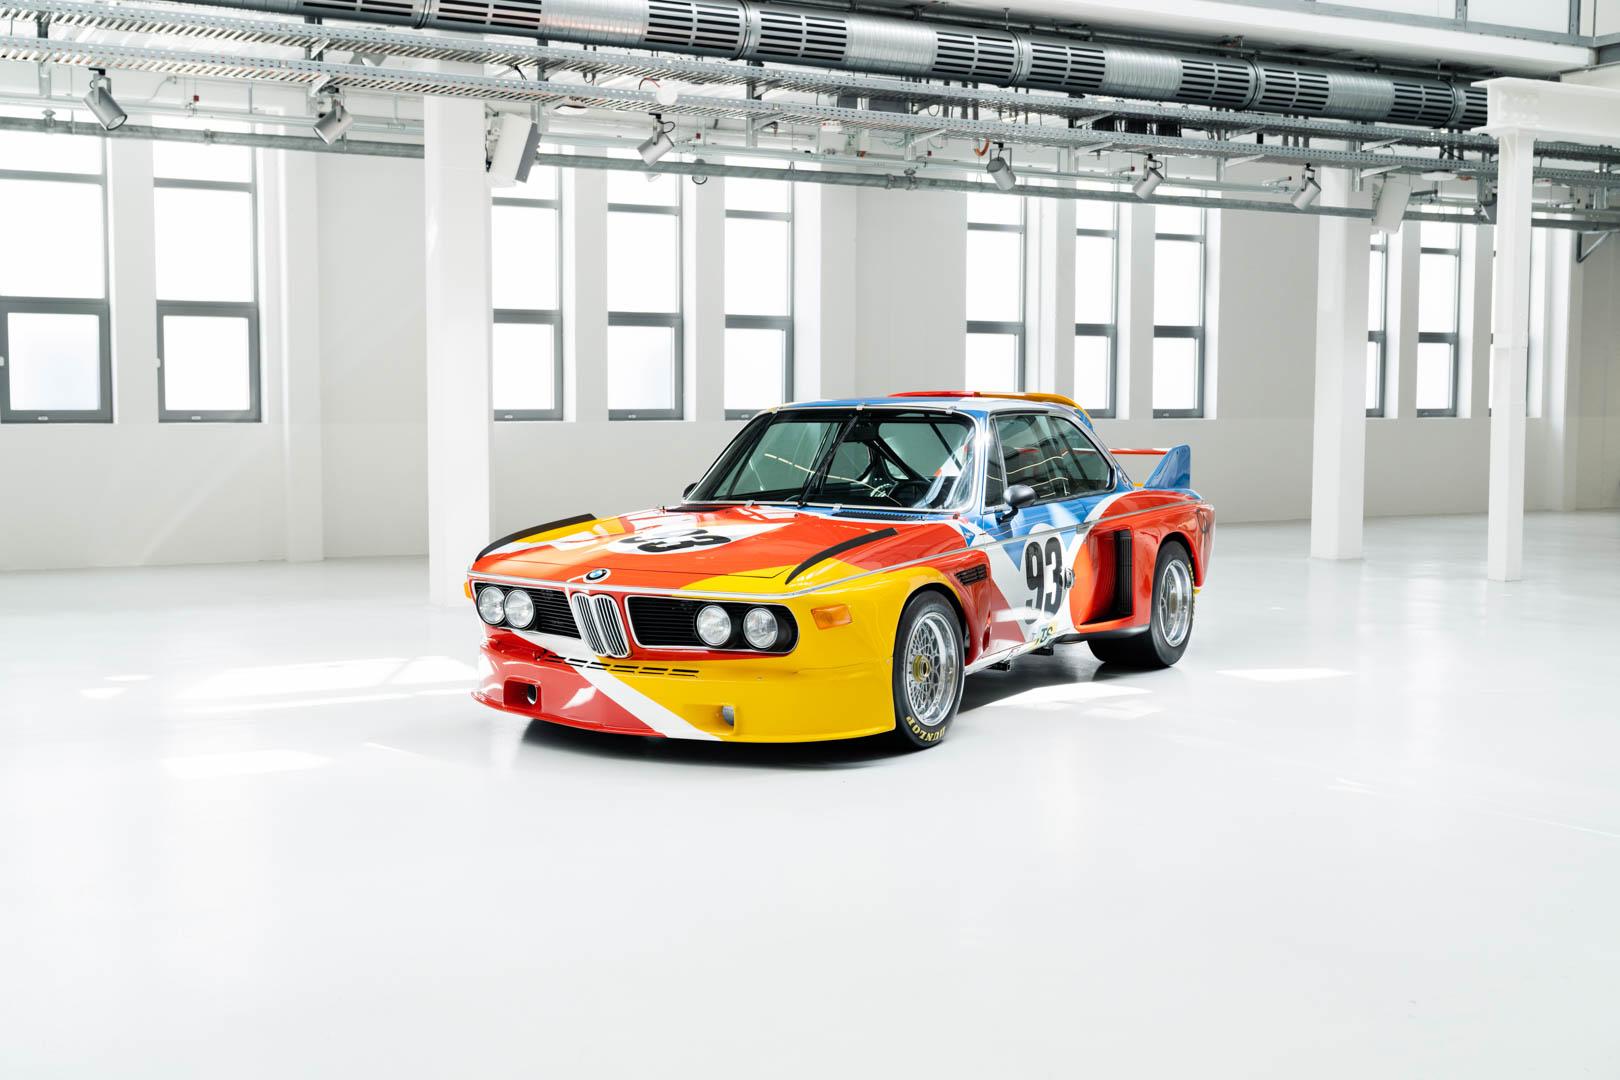 Alexander Calder Art Car BMW 3.0 CSL 48 of 55